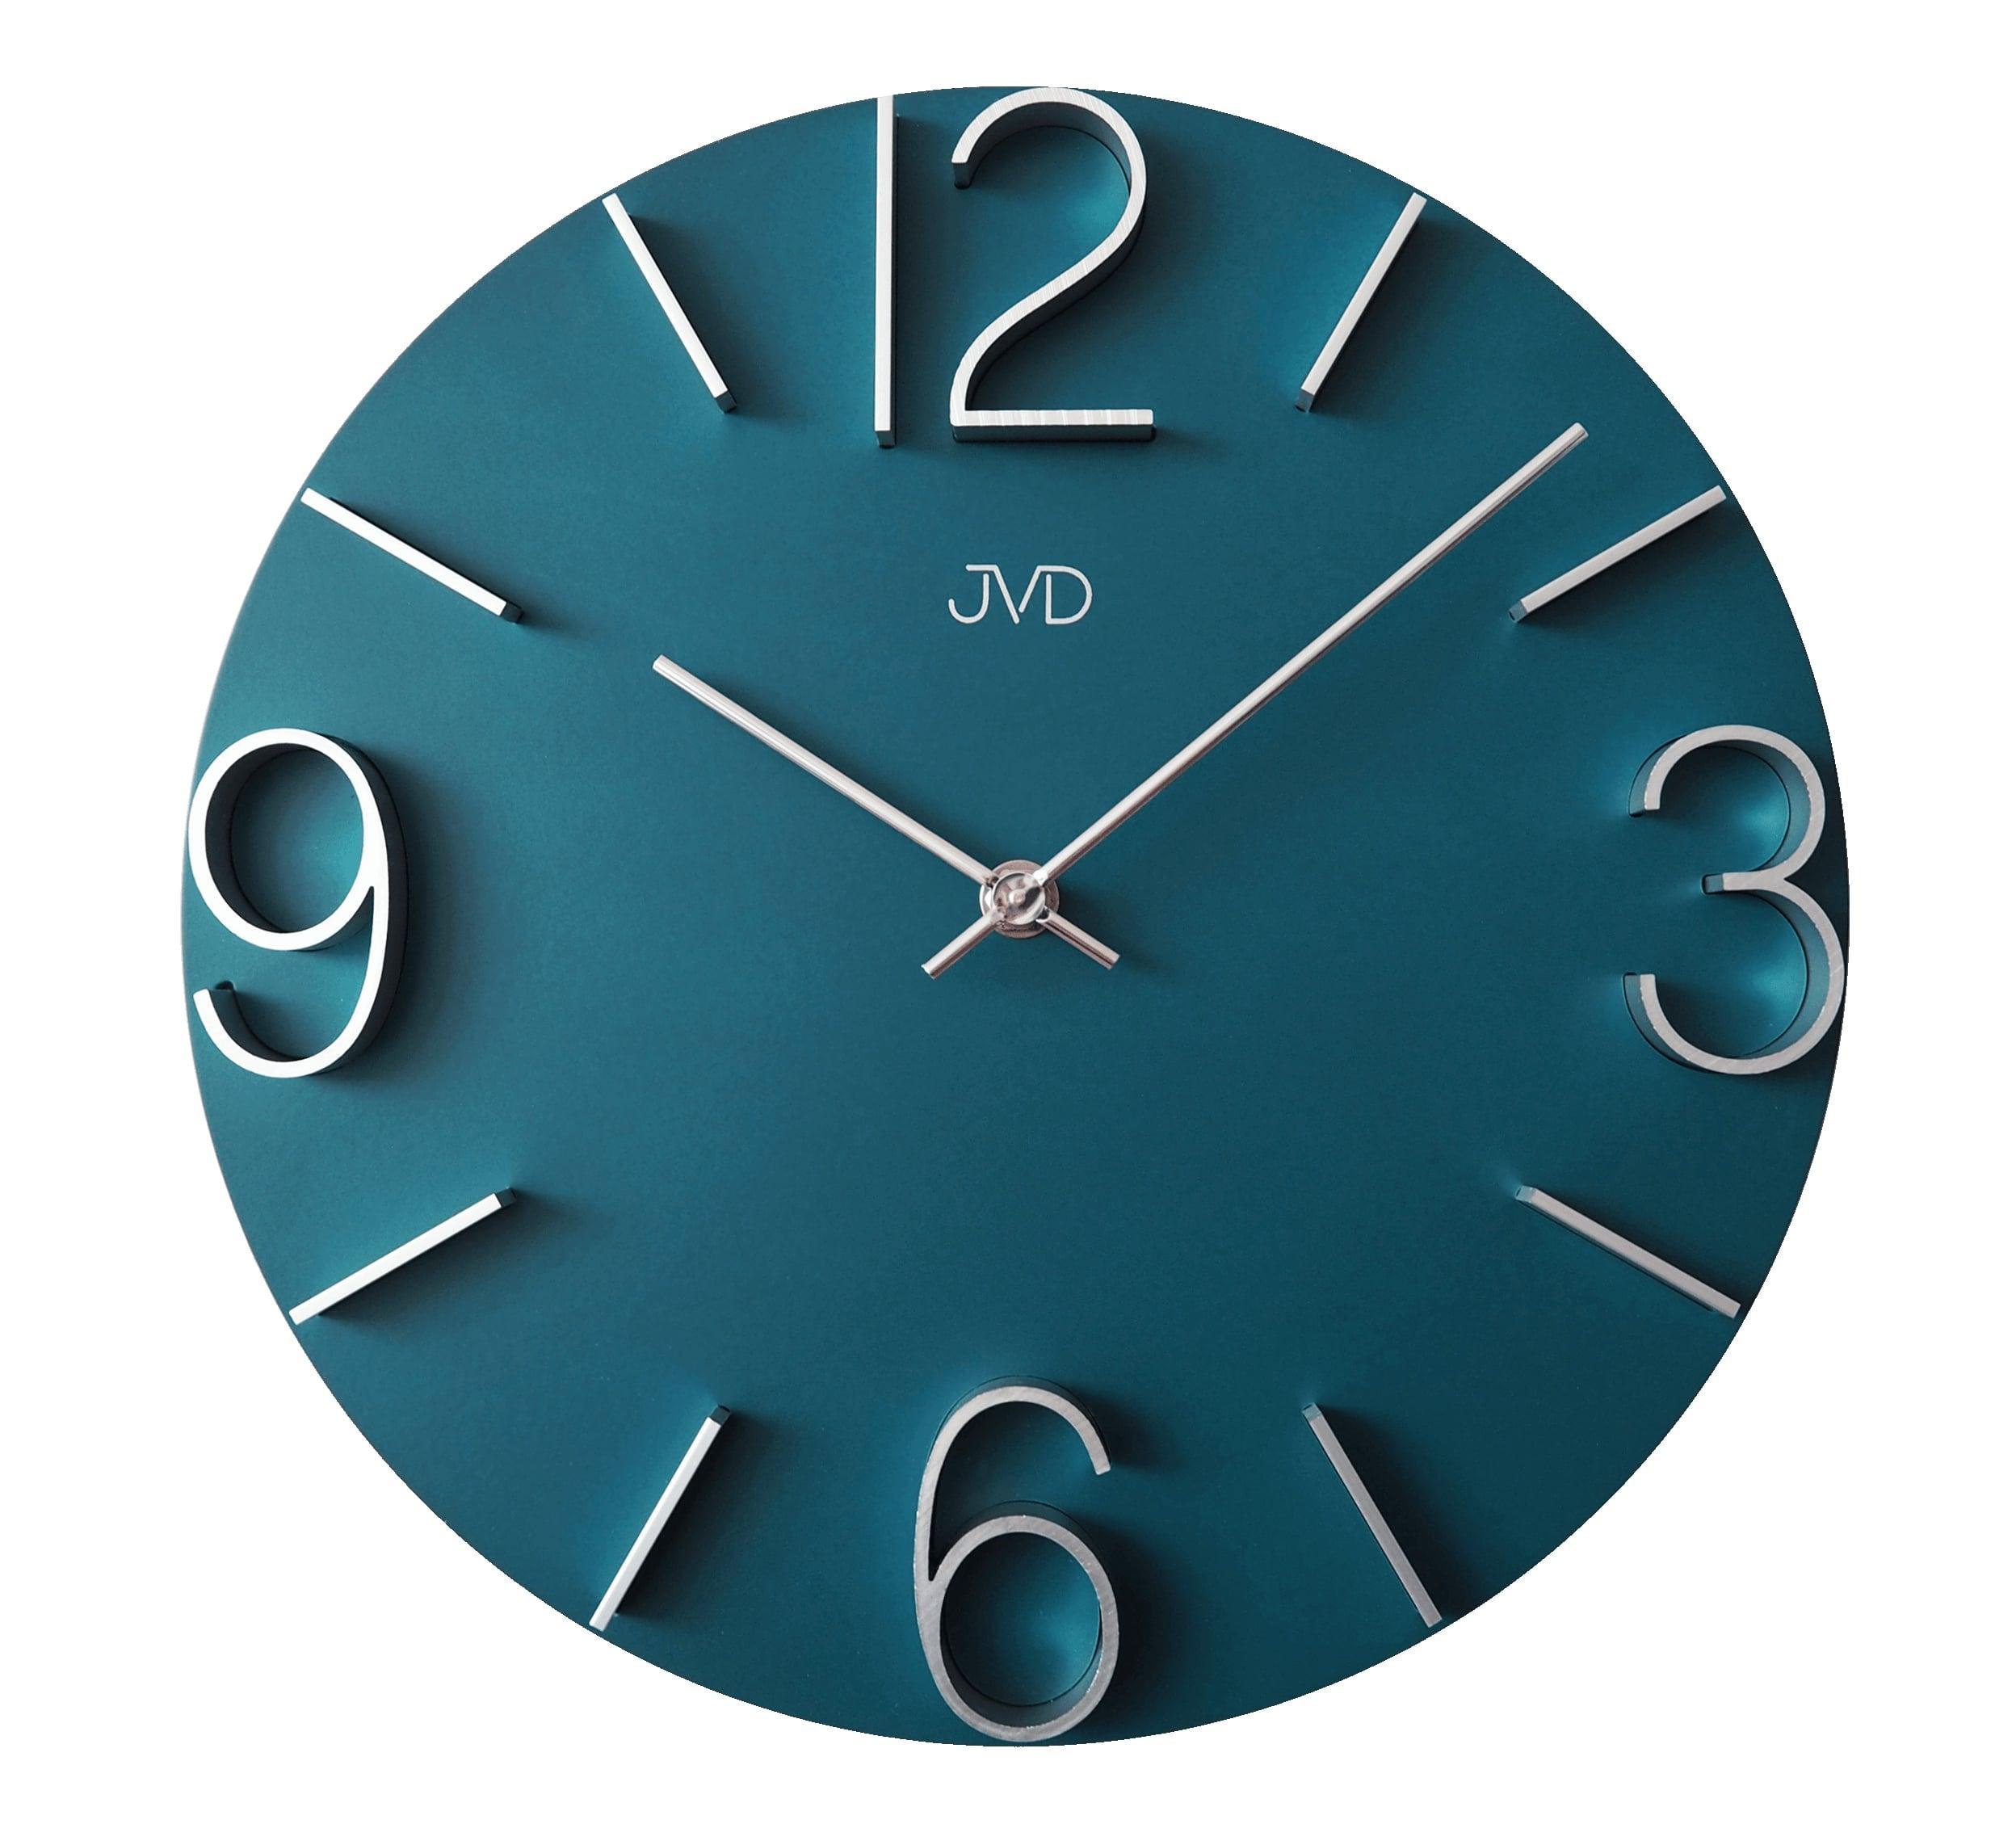 Dizajnové nástenné hodiny JVD HC37.3, 30 cm